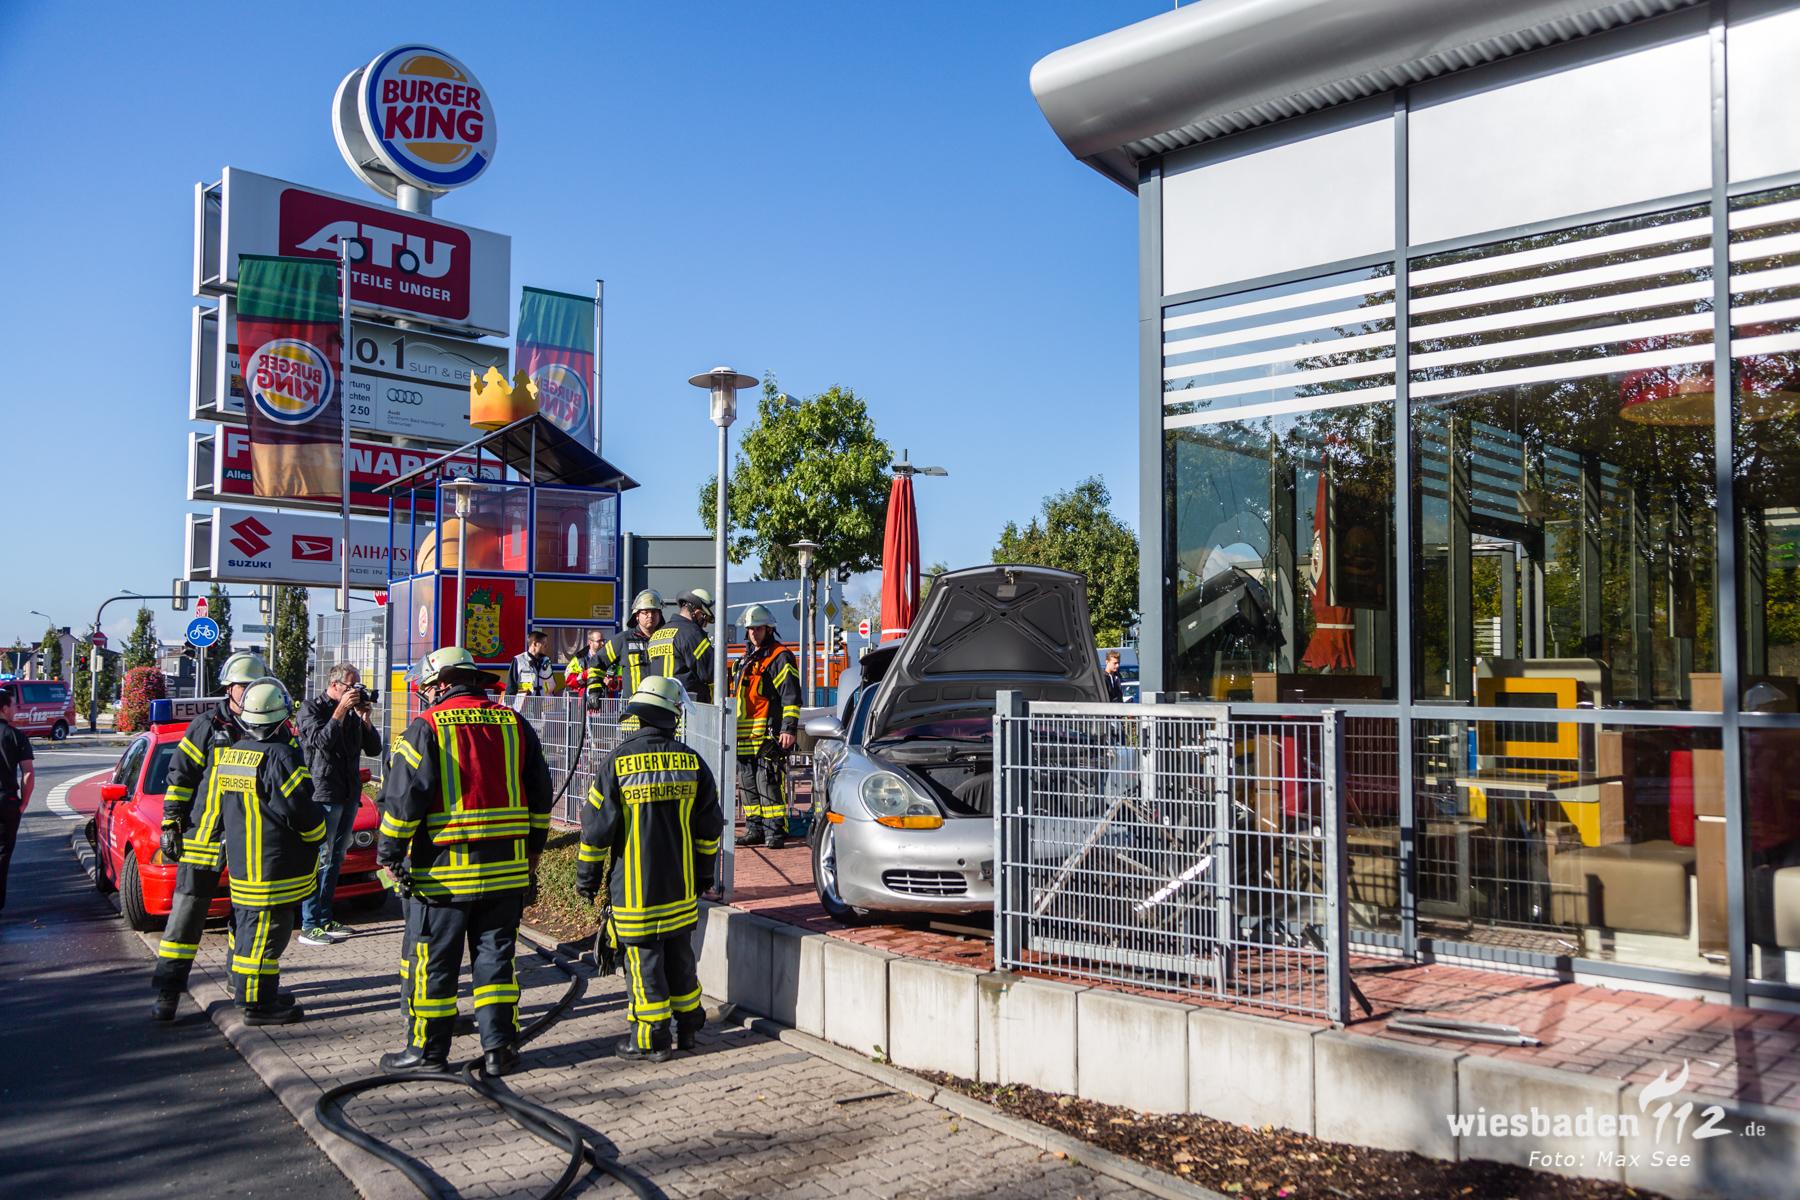 Burger King Lieferservice Wiesbaden